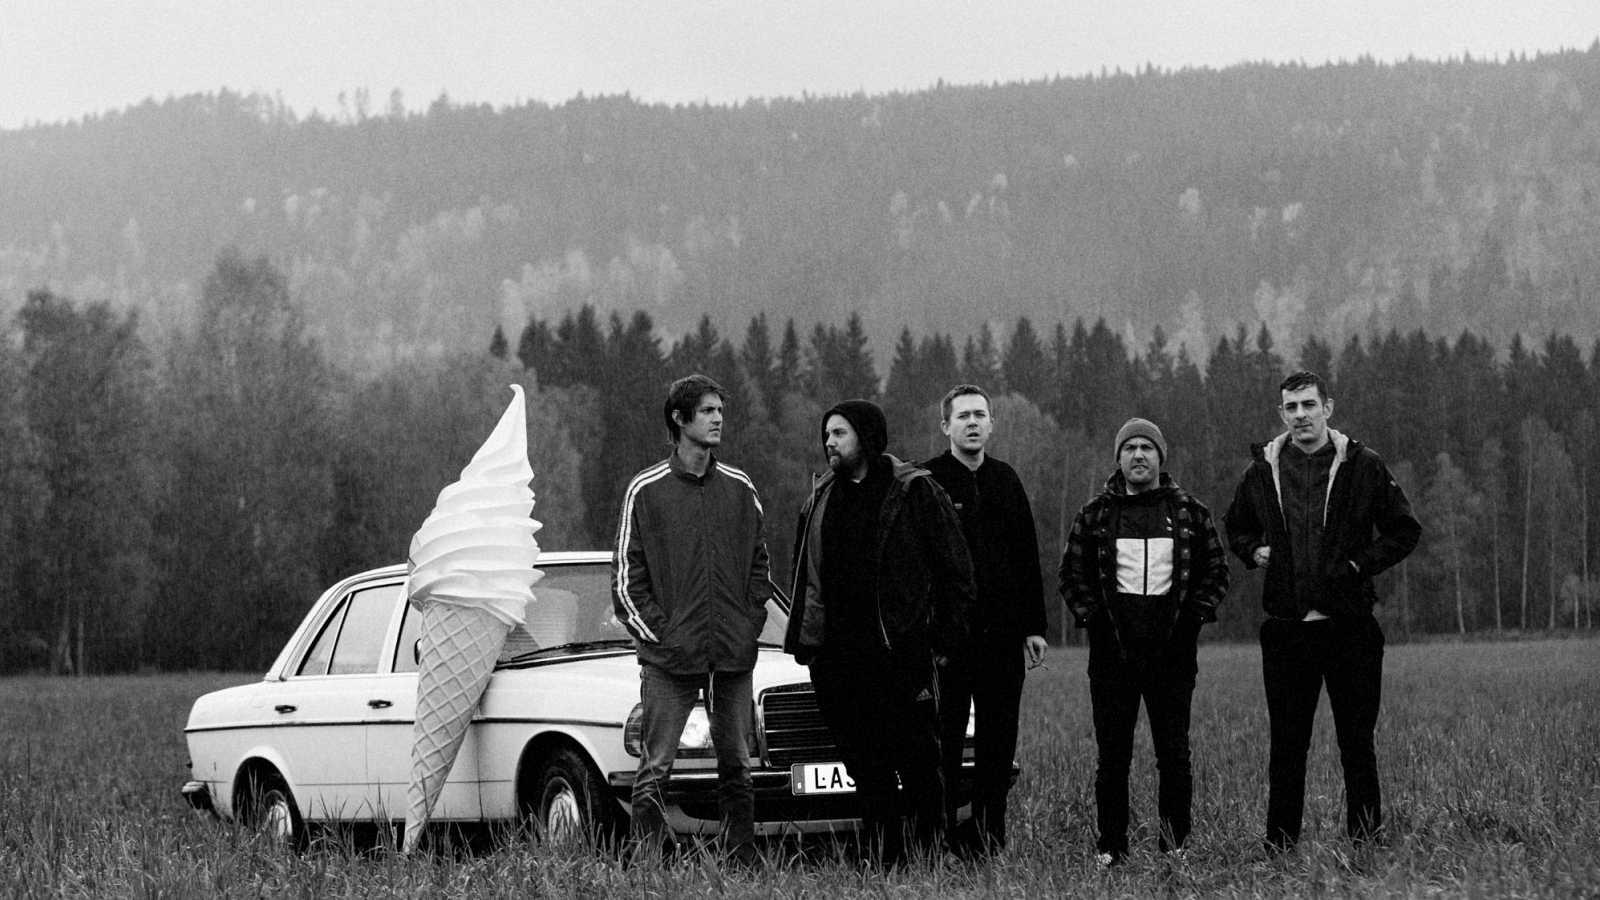 Na Na Na - Post punk y verdades: Viagra Boys, Shame y Sleaford Mods - 12/01/21 - escuchar ahora